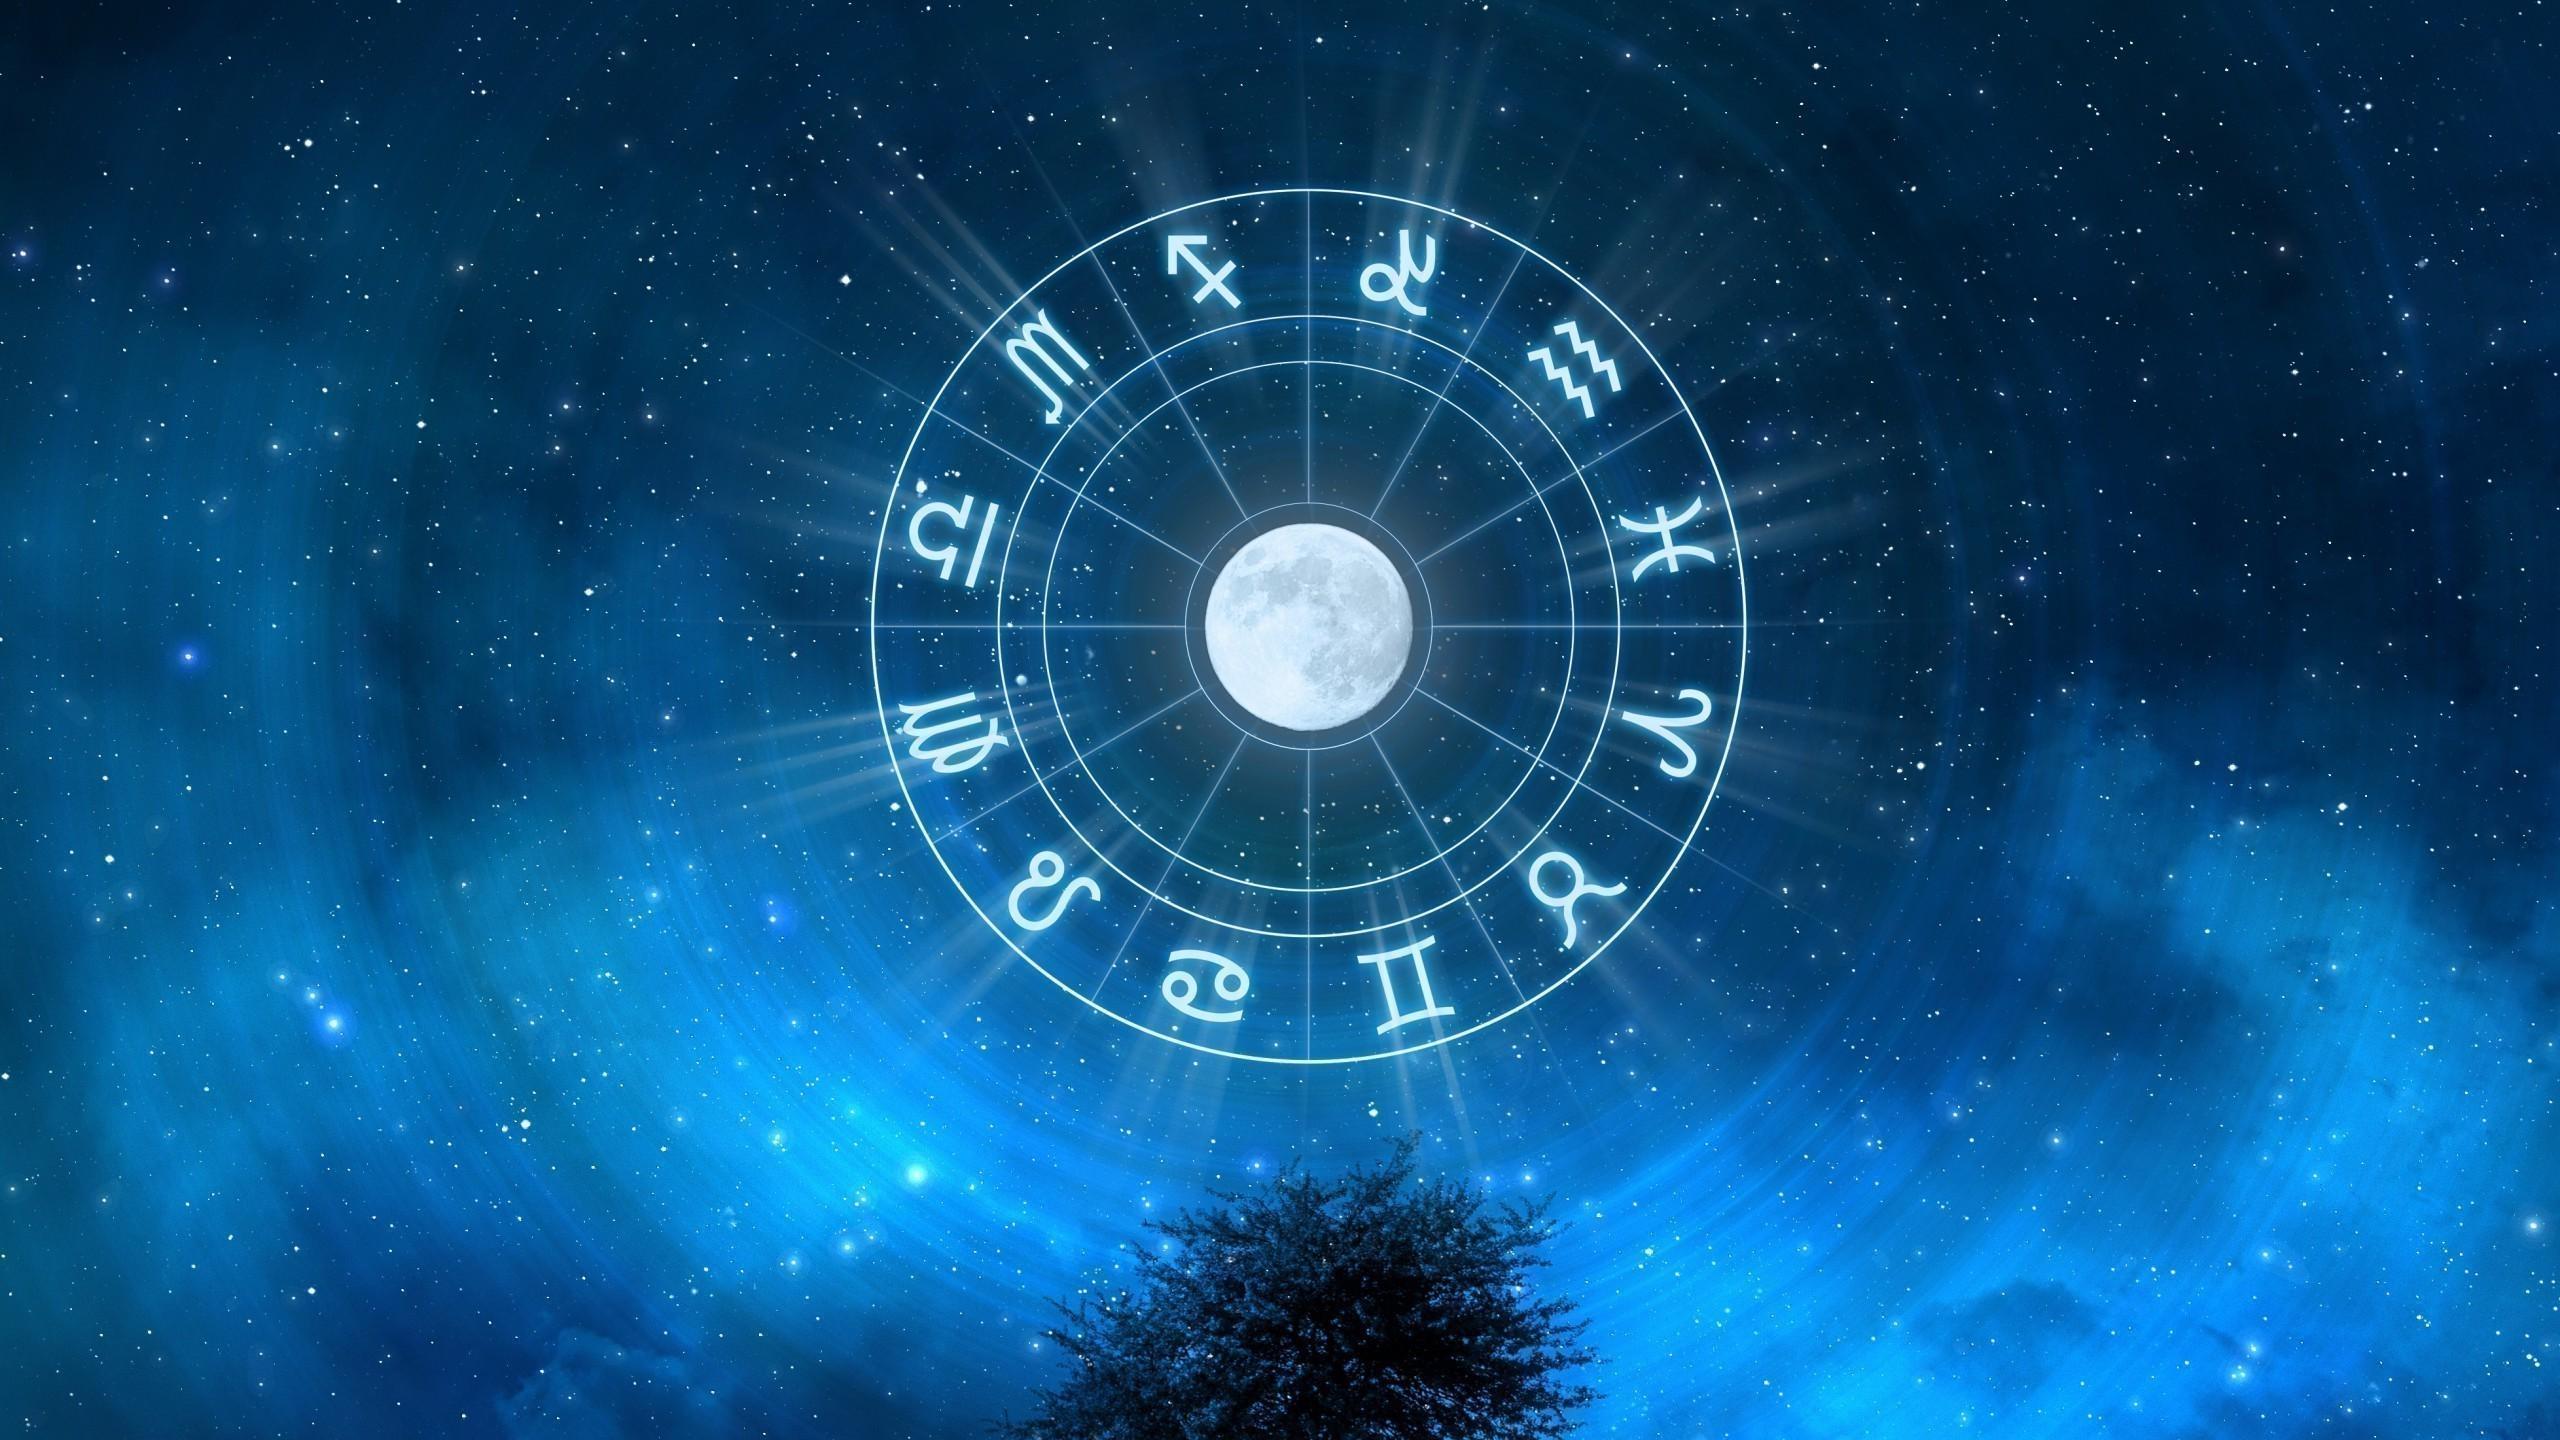 Horoscope Wallpapers Wallpaper Cave